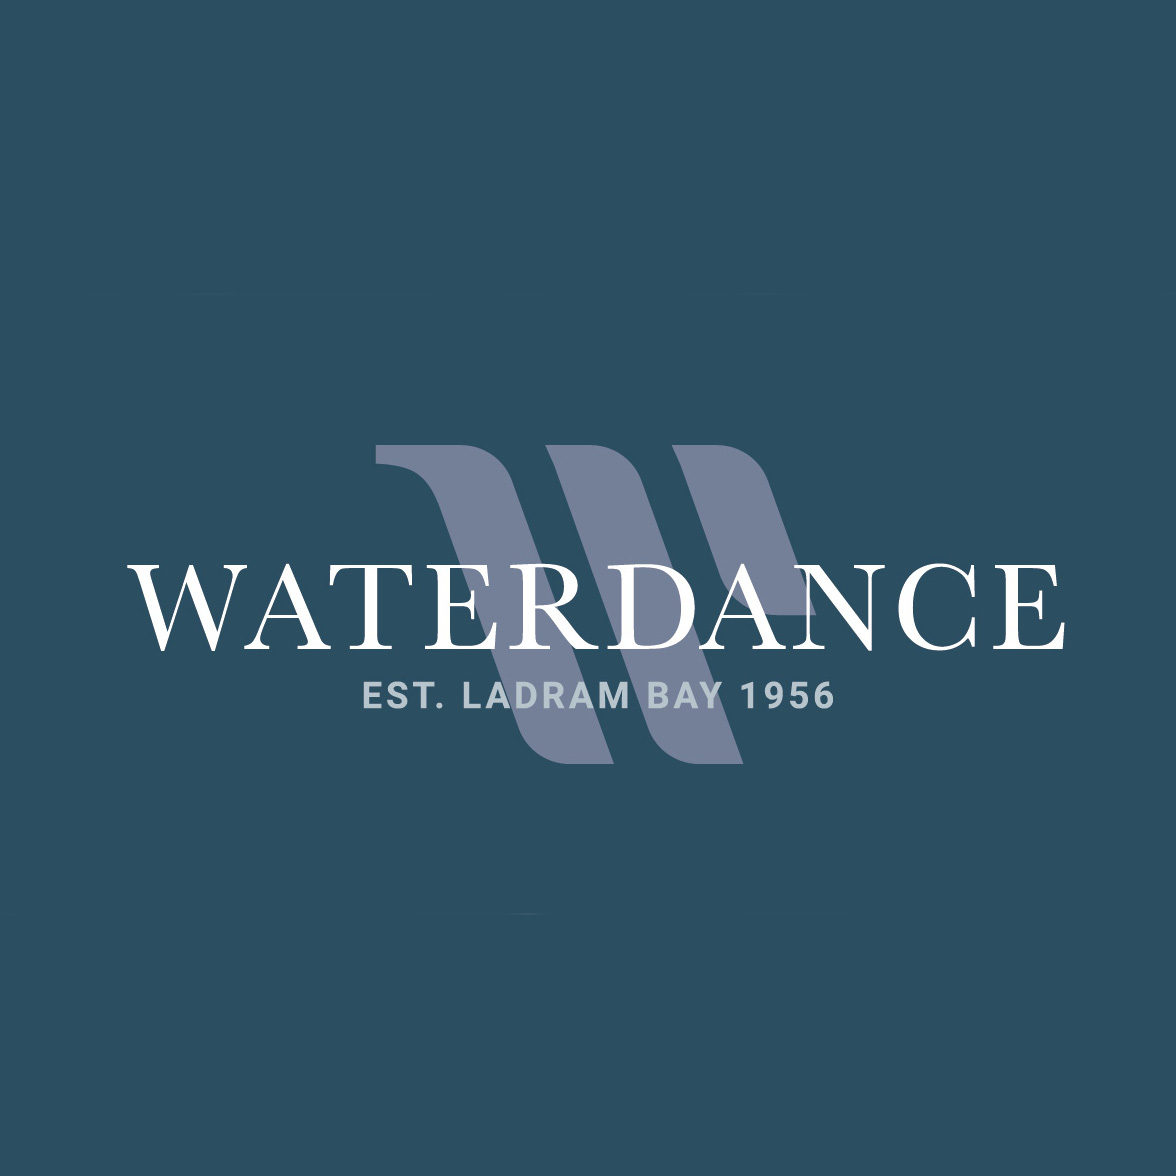 WATERDANCE_LOGO_BLUE-01_SQUARE.jpg